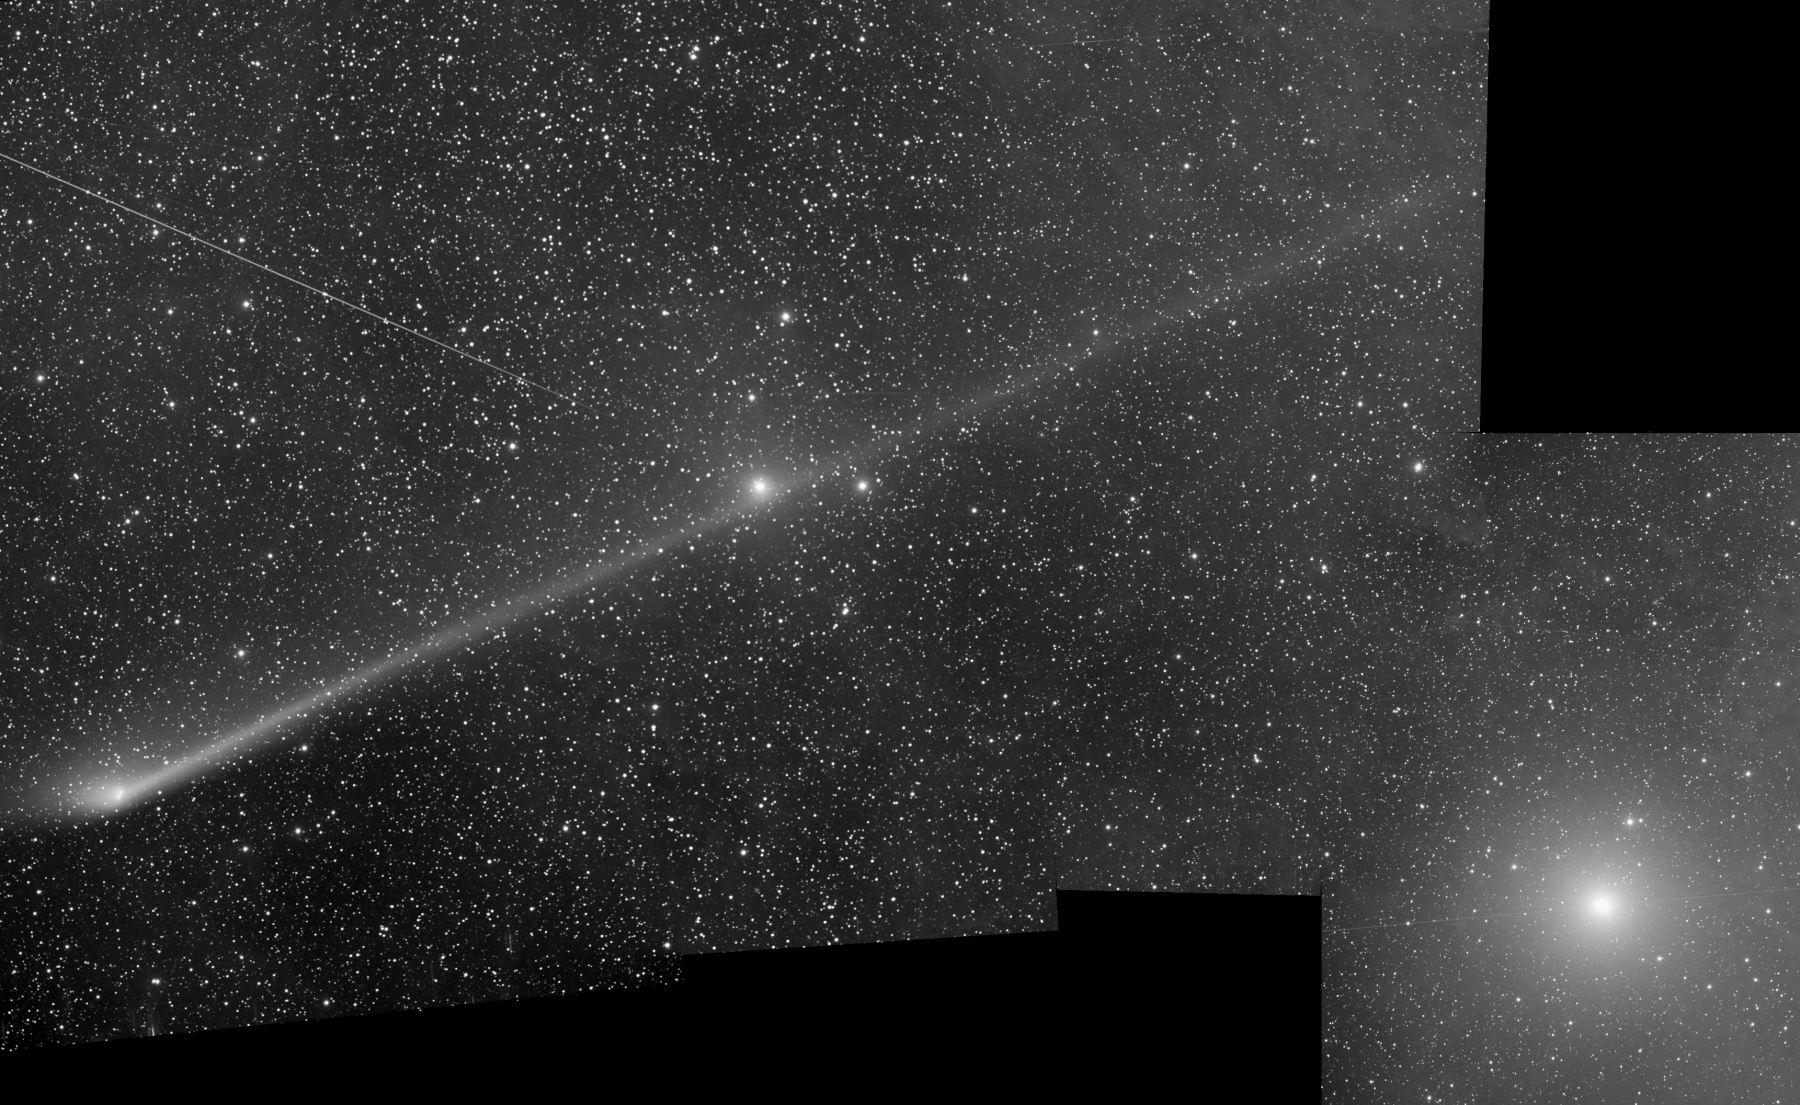 Комета C/2011 L4 Panstarrs и Полярная звезда